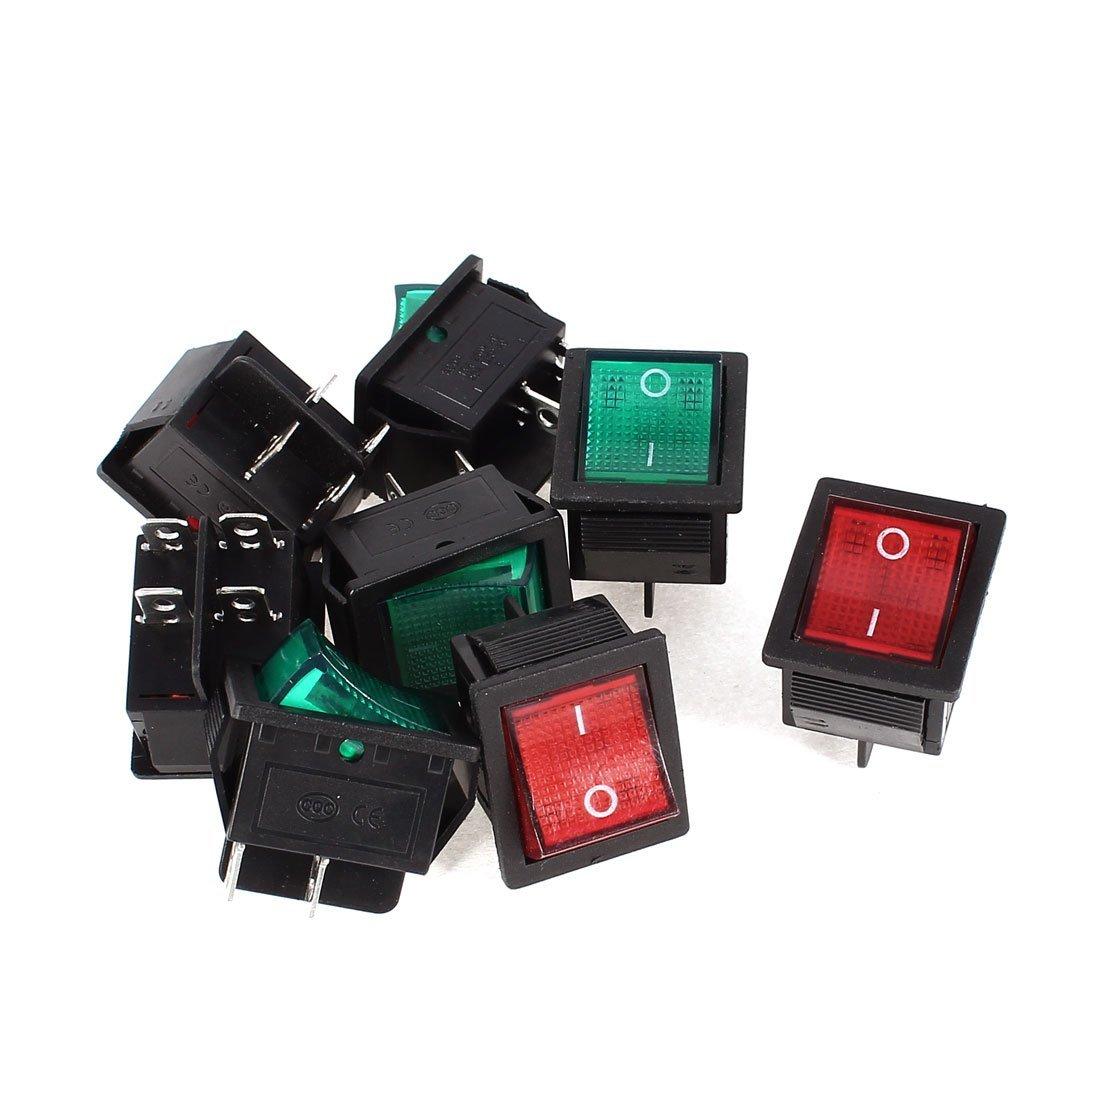 15A / 20A 250V / 125V DPST E / S Interruptor basculante KCD4 8PCS Rojo Verde DealMux